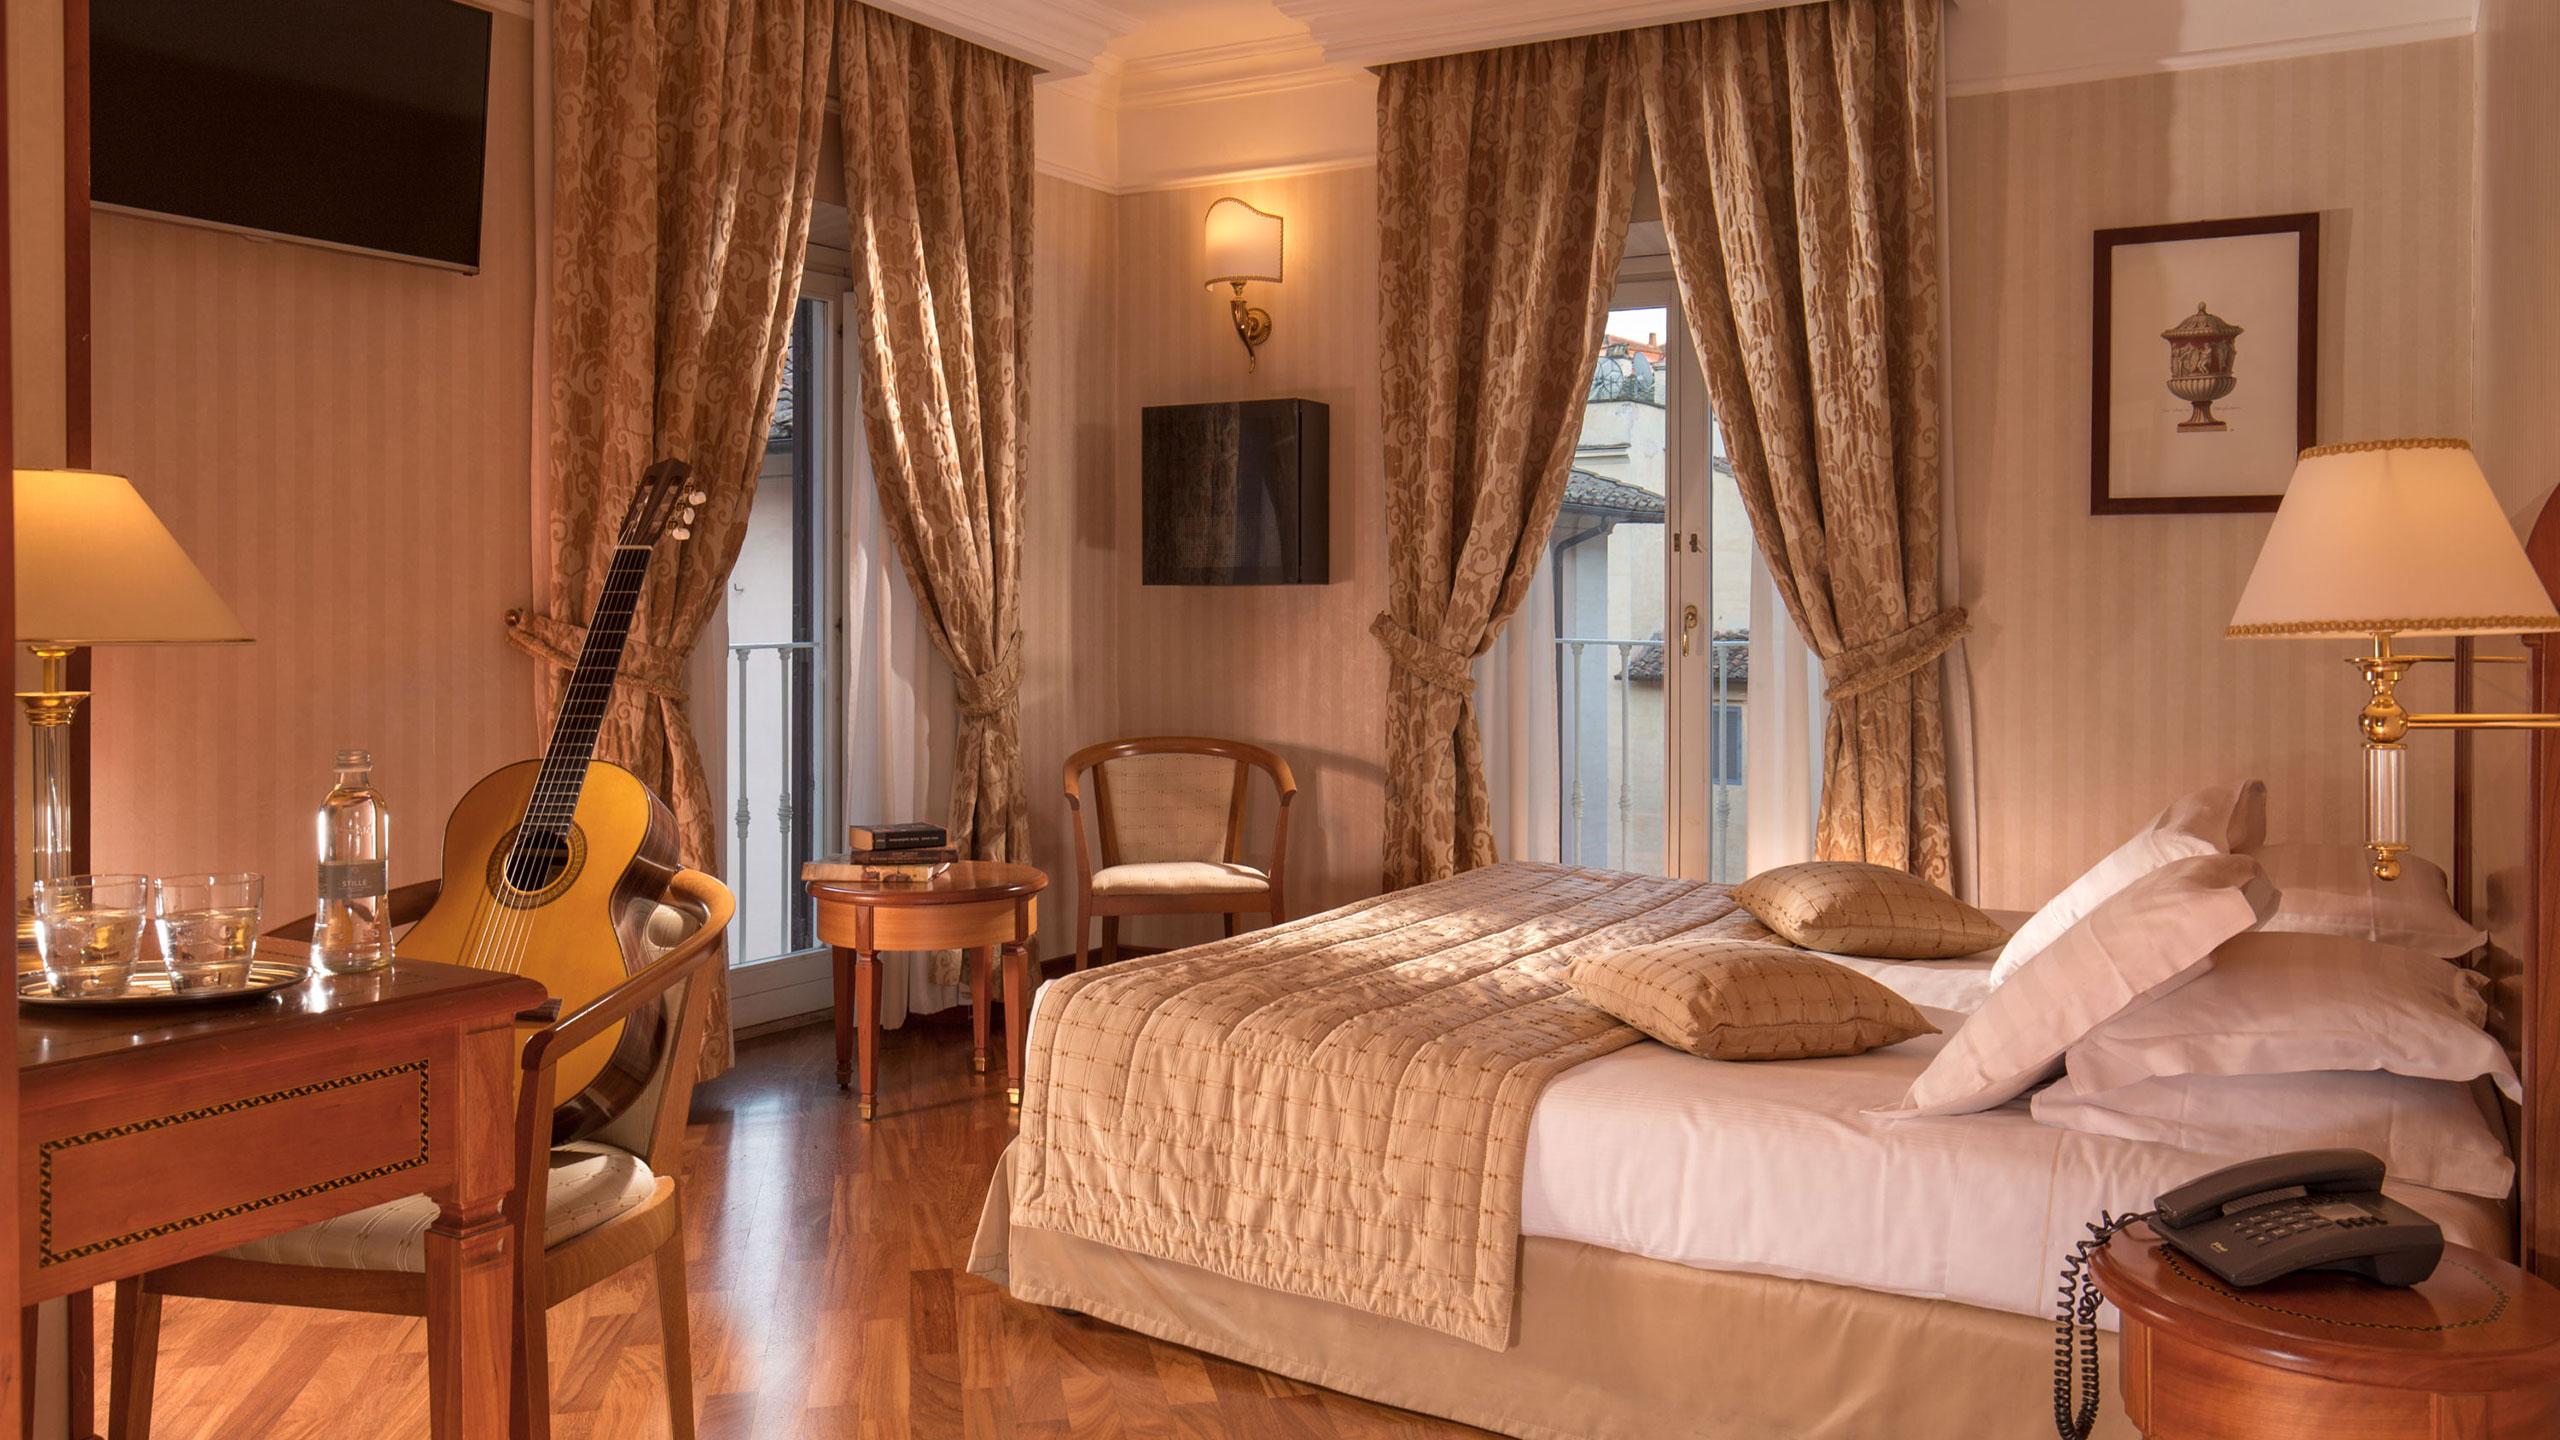 albergo-ottocento-rome-double-room-deluxe-06